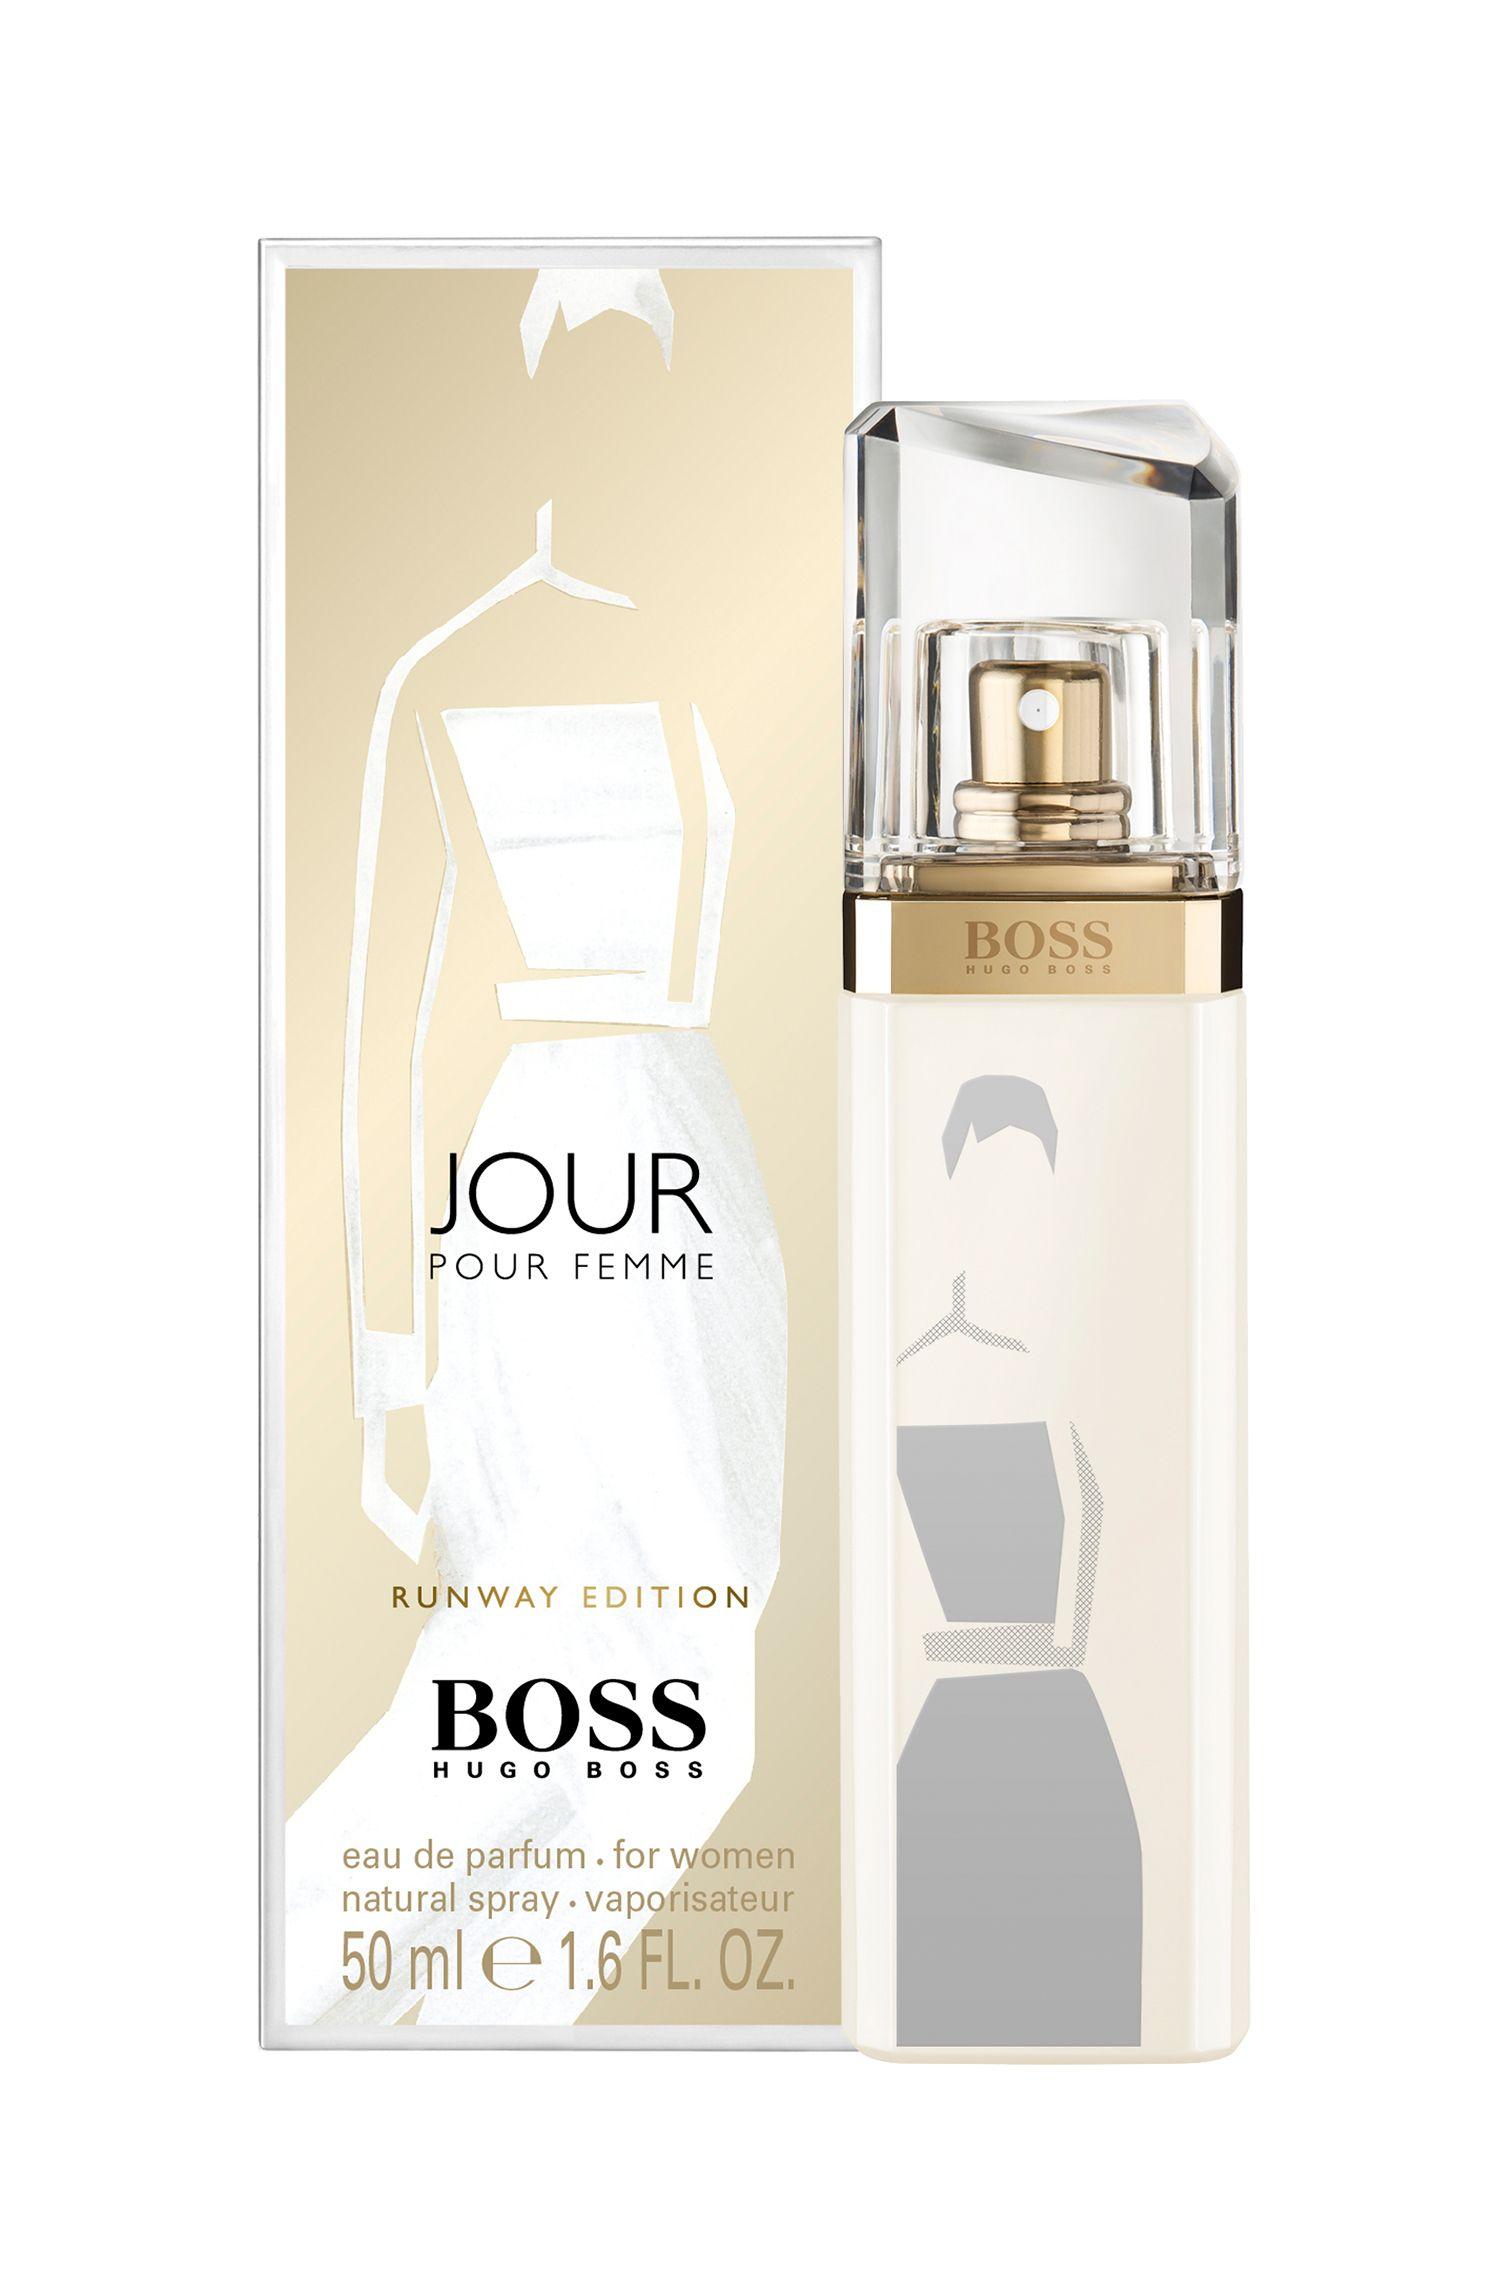 boss jour pour femme runway edition hugo boss perfume a. Black Bedroom Furniture Sets. Home Design Ideas